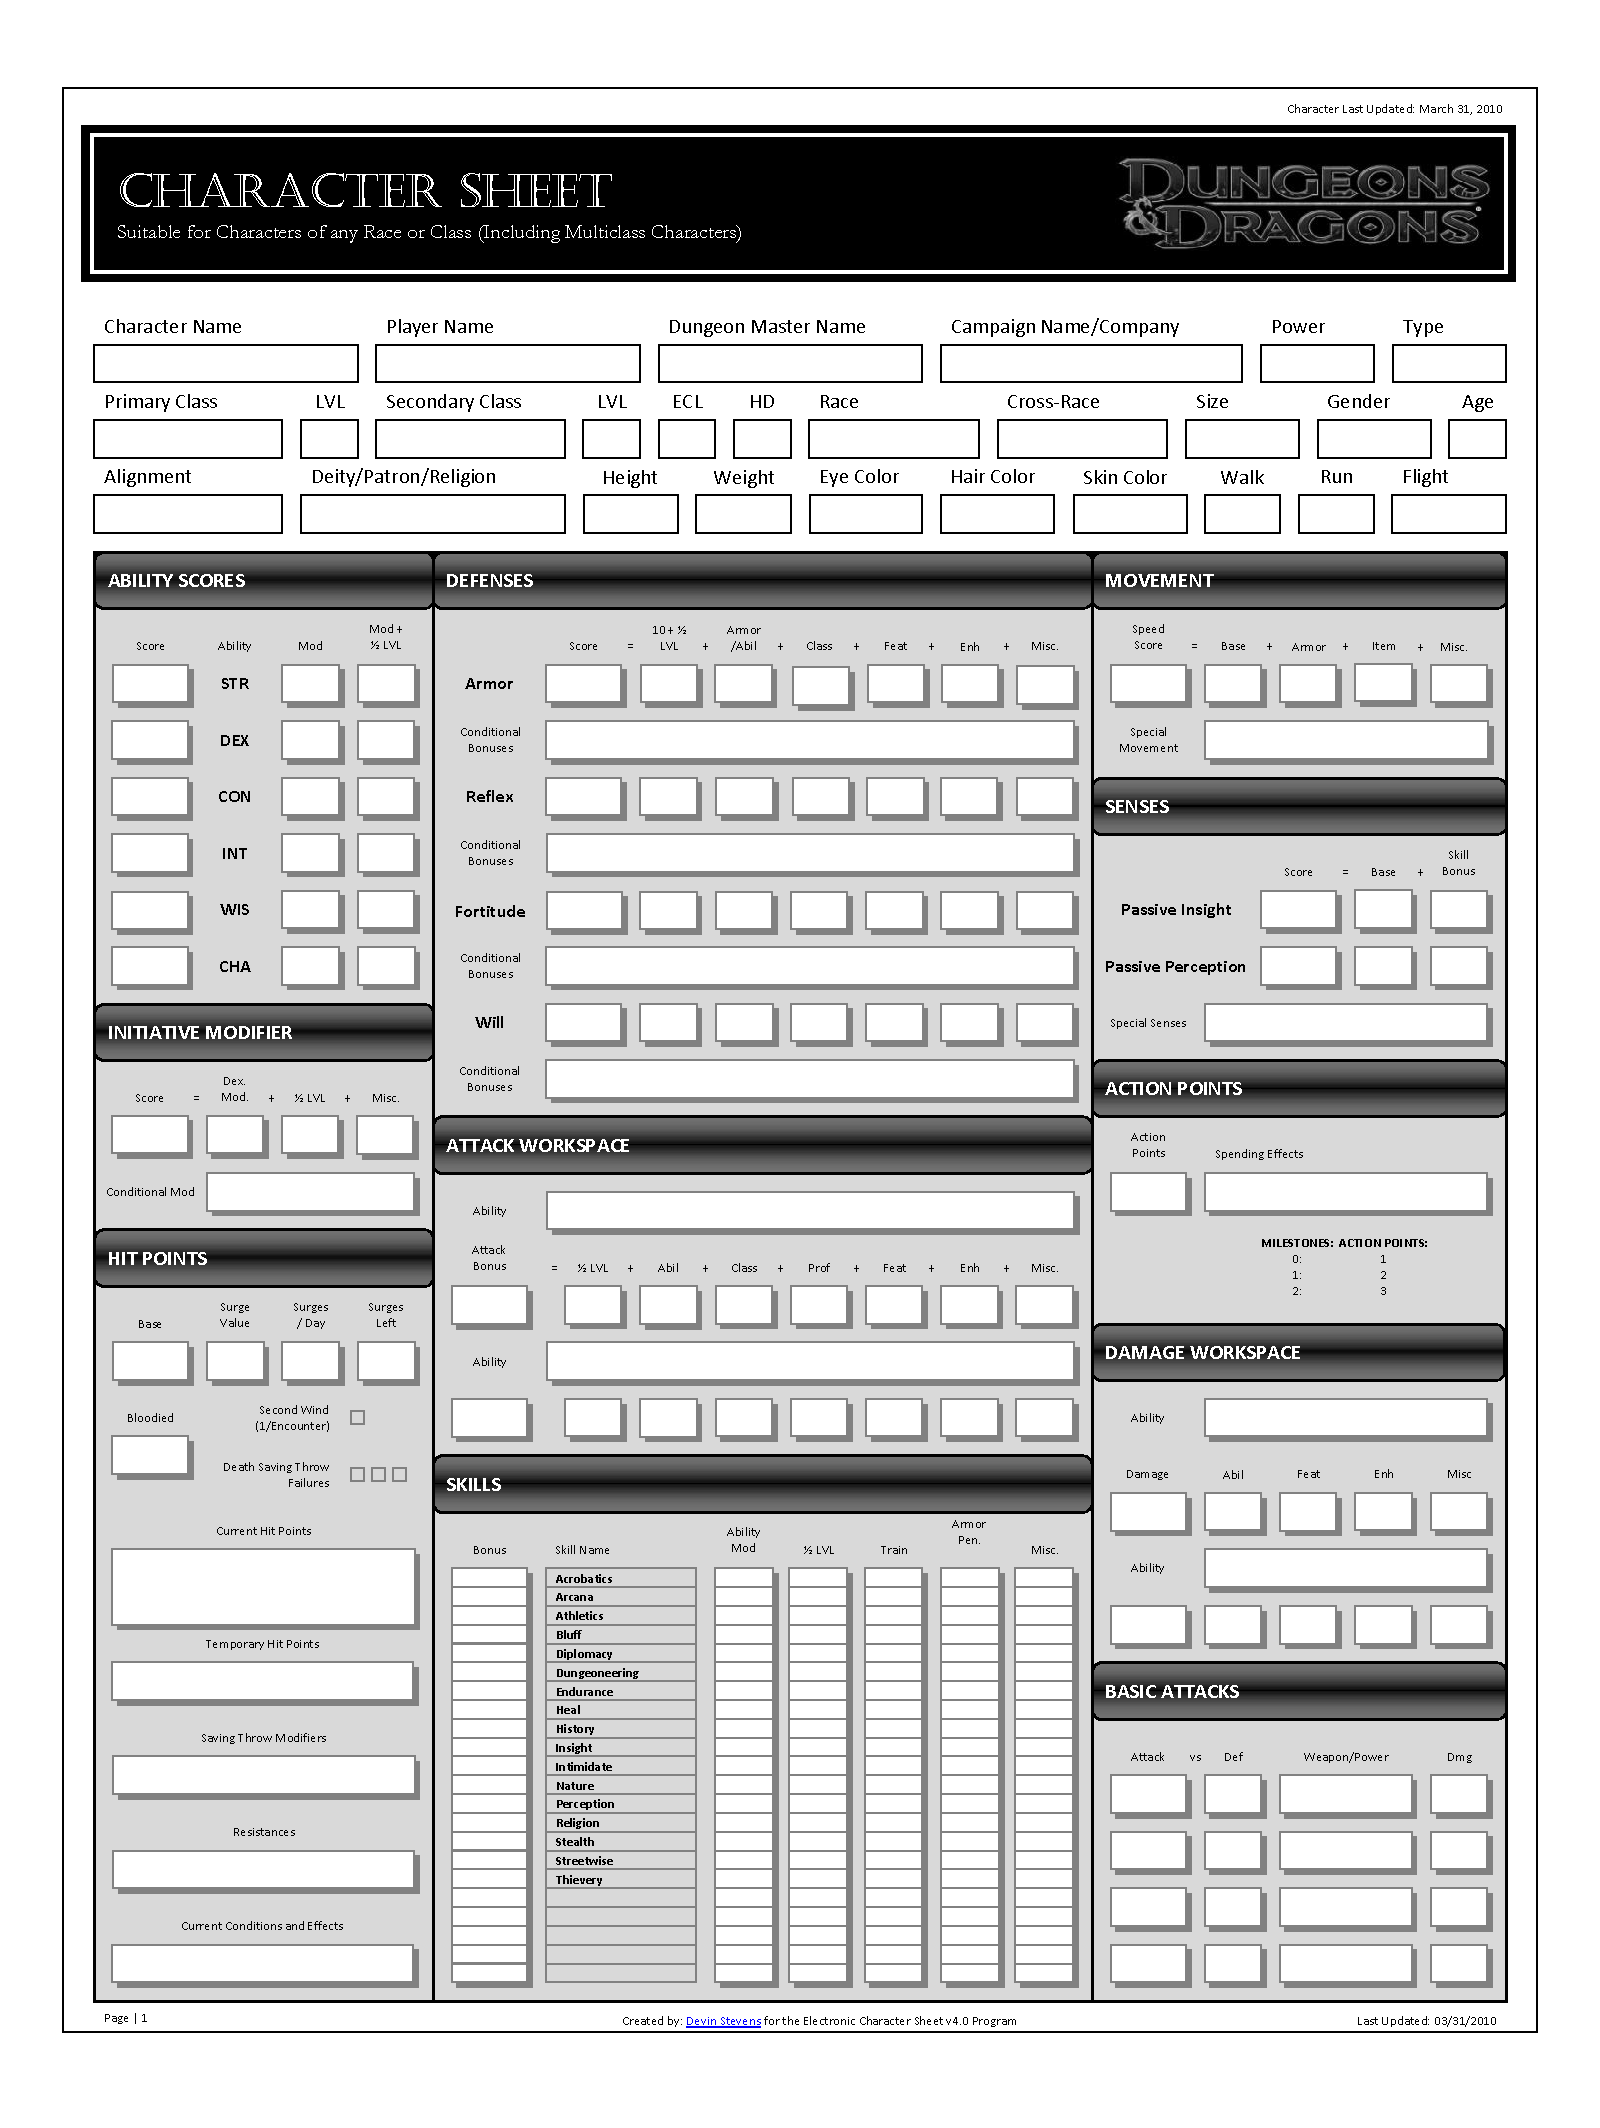 ECS Character Sheet 4.0 BW by SacredFootballLB